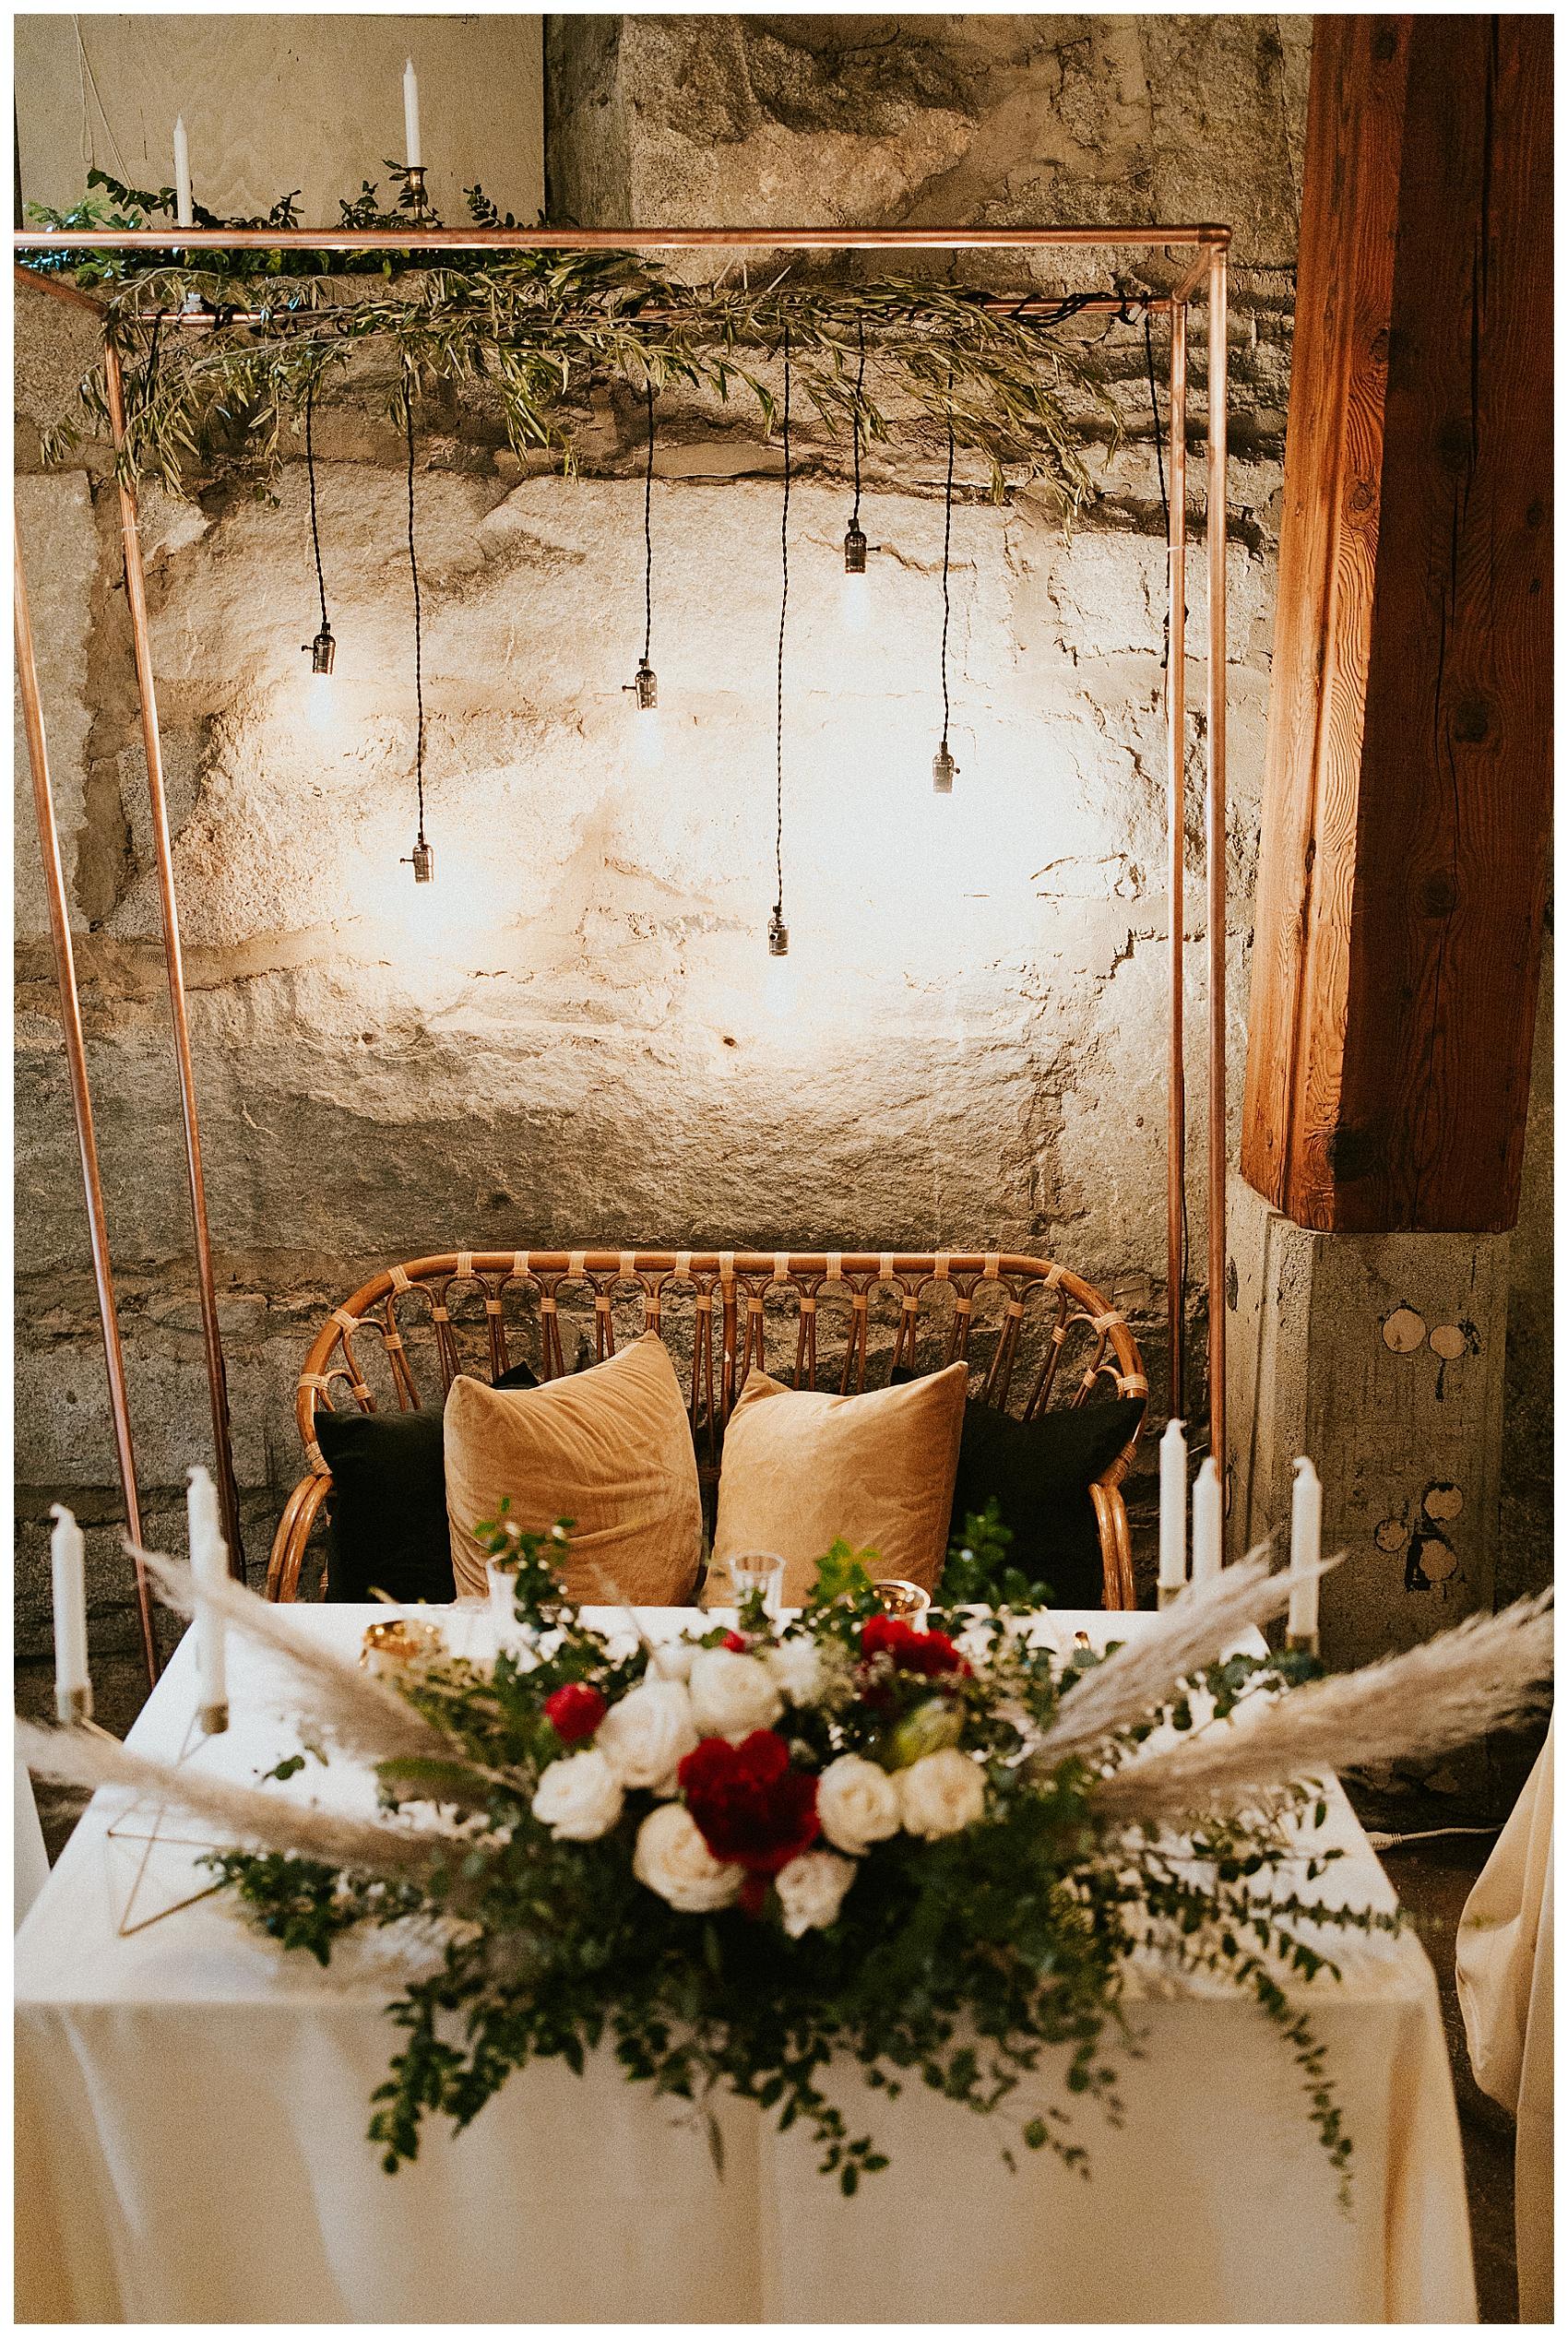 Chateau Rive Spokane Wedding Cassie Trottier Photography01035.jpg